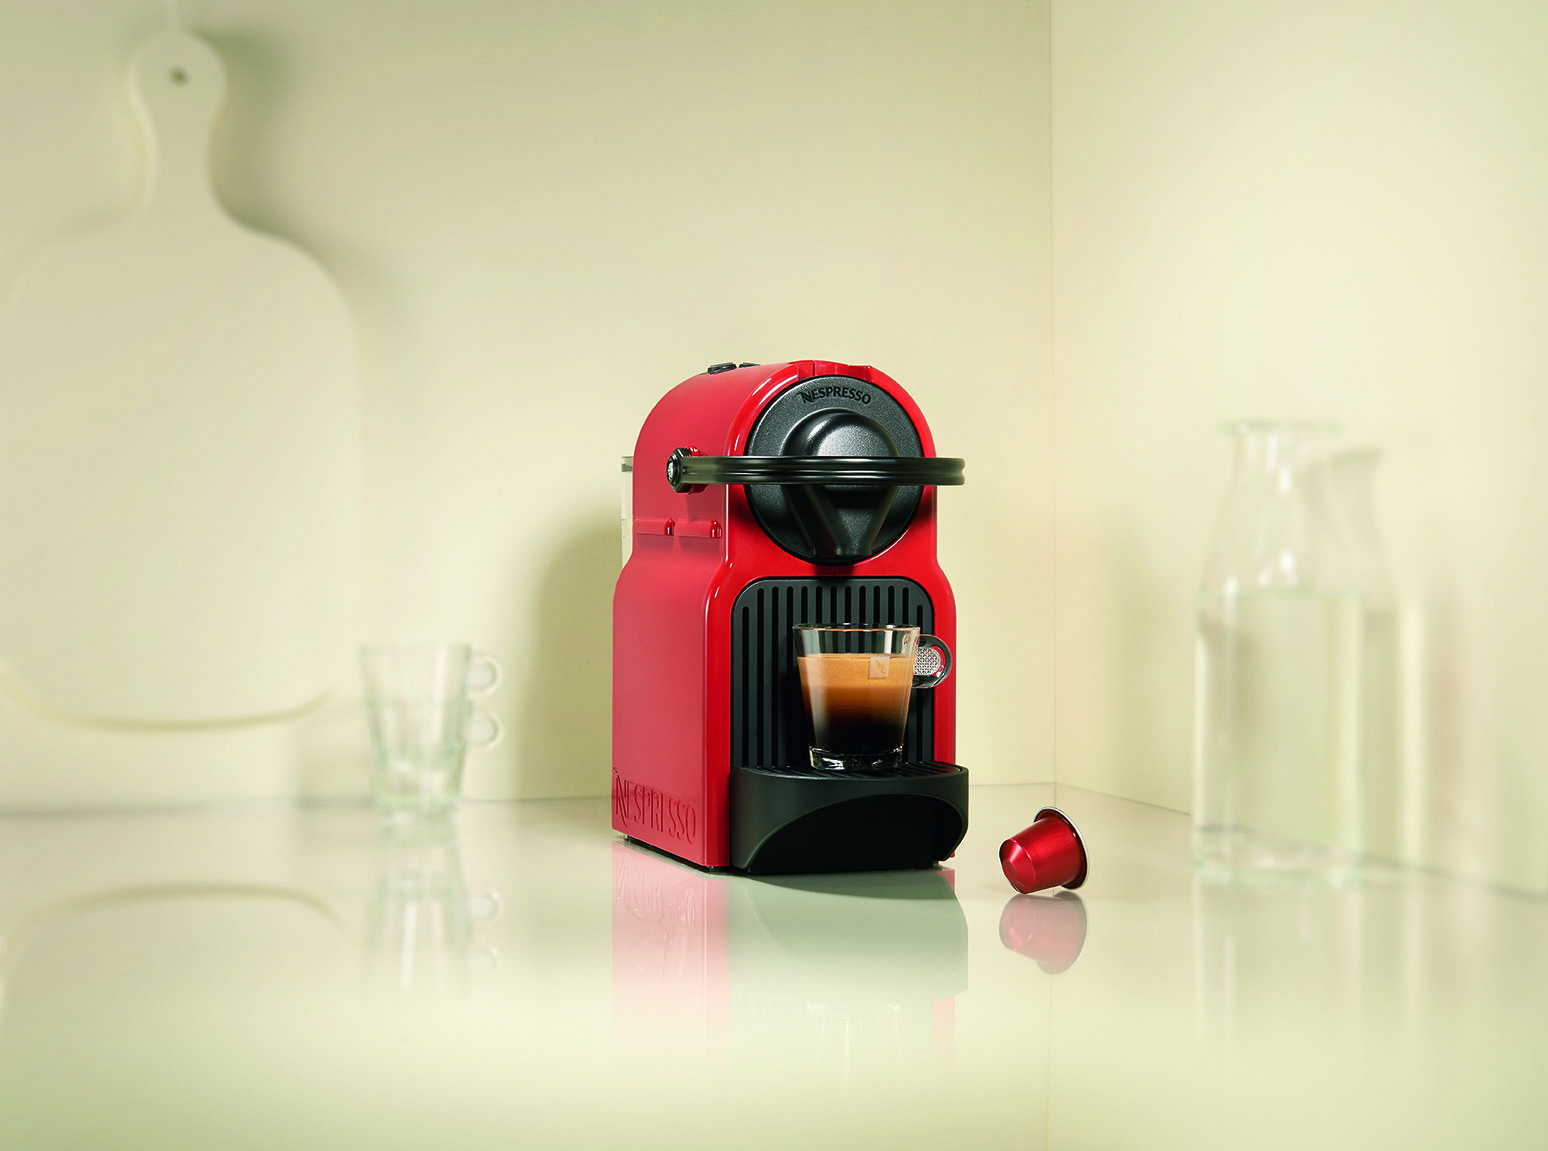 The new Nespresso Inissia coffee machine in Ruby Red